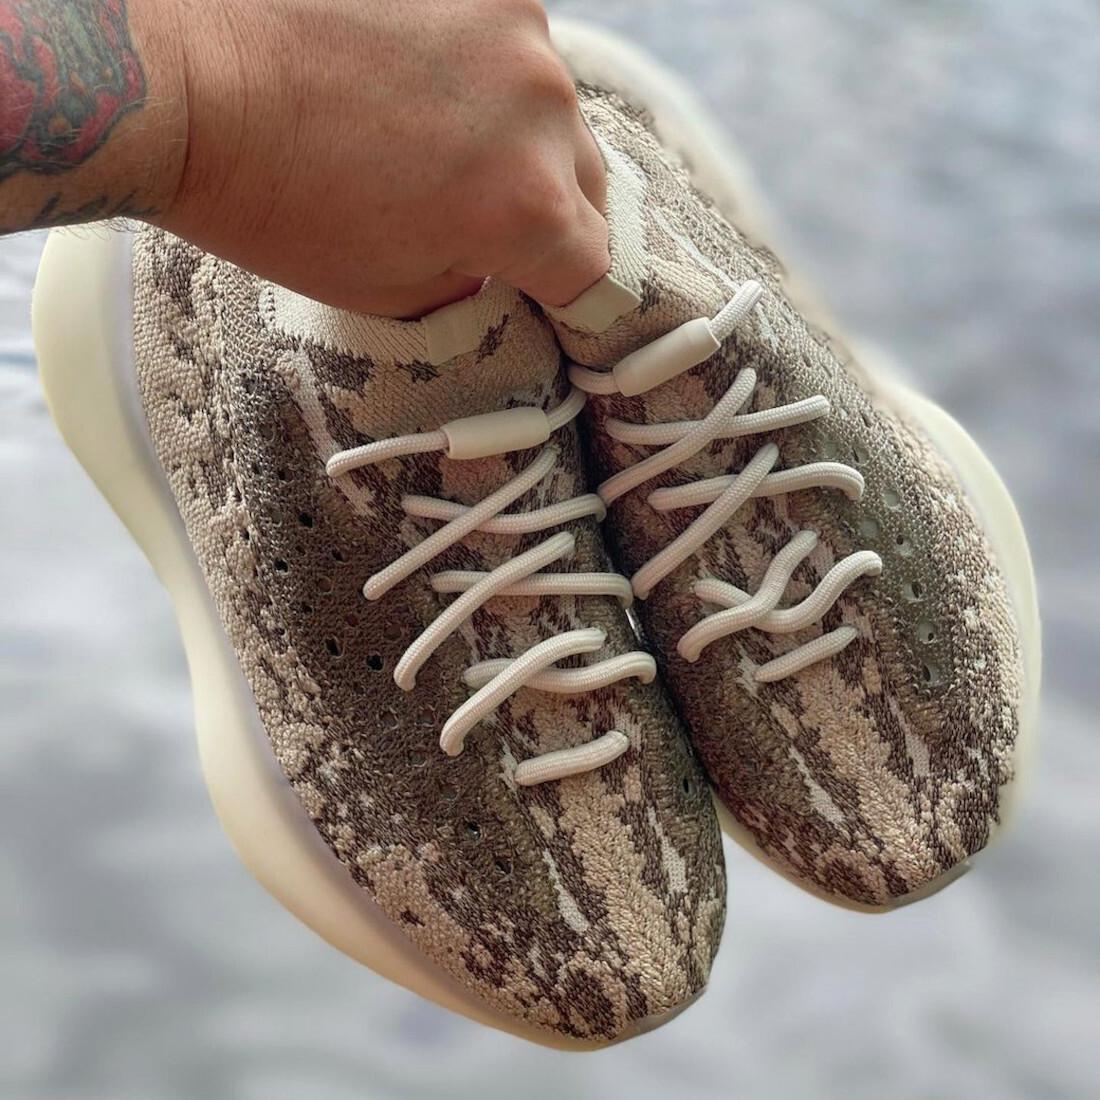 adidas yeezy boost 380 stone salt GZ0473 temp 05